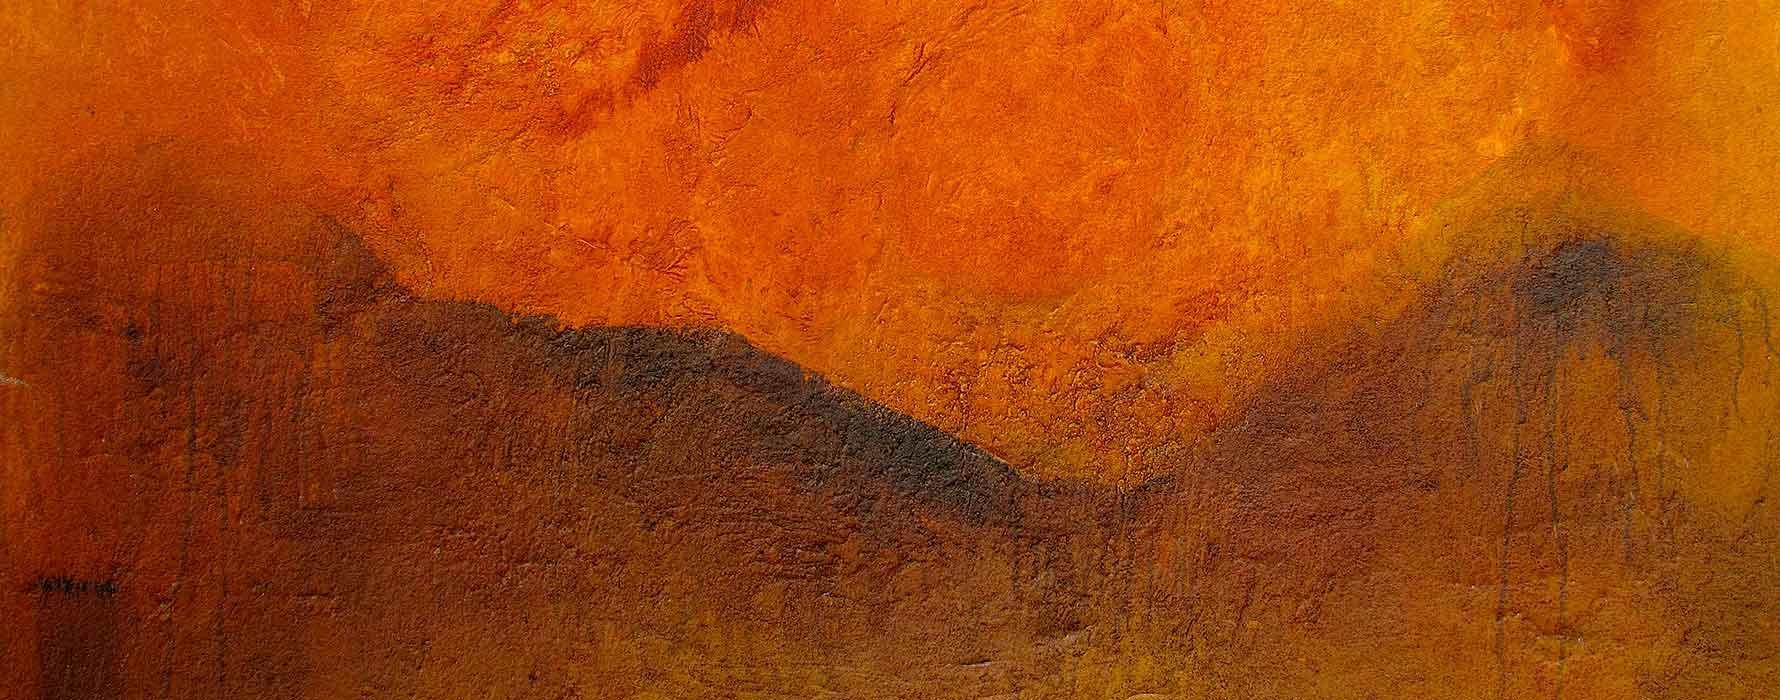 Orange and rust painting